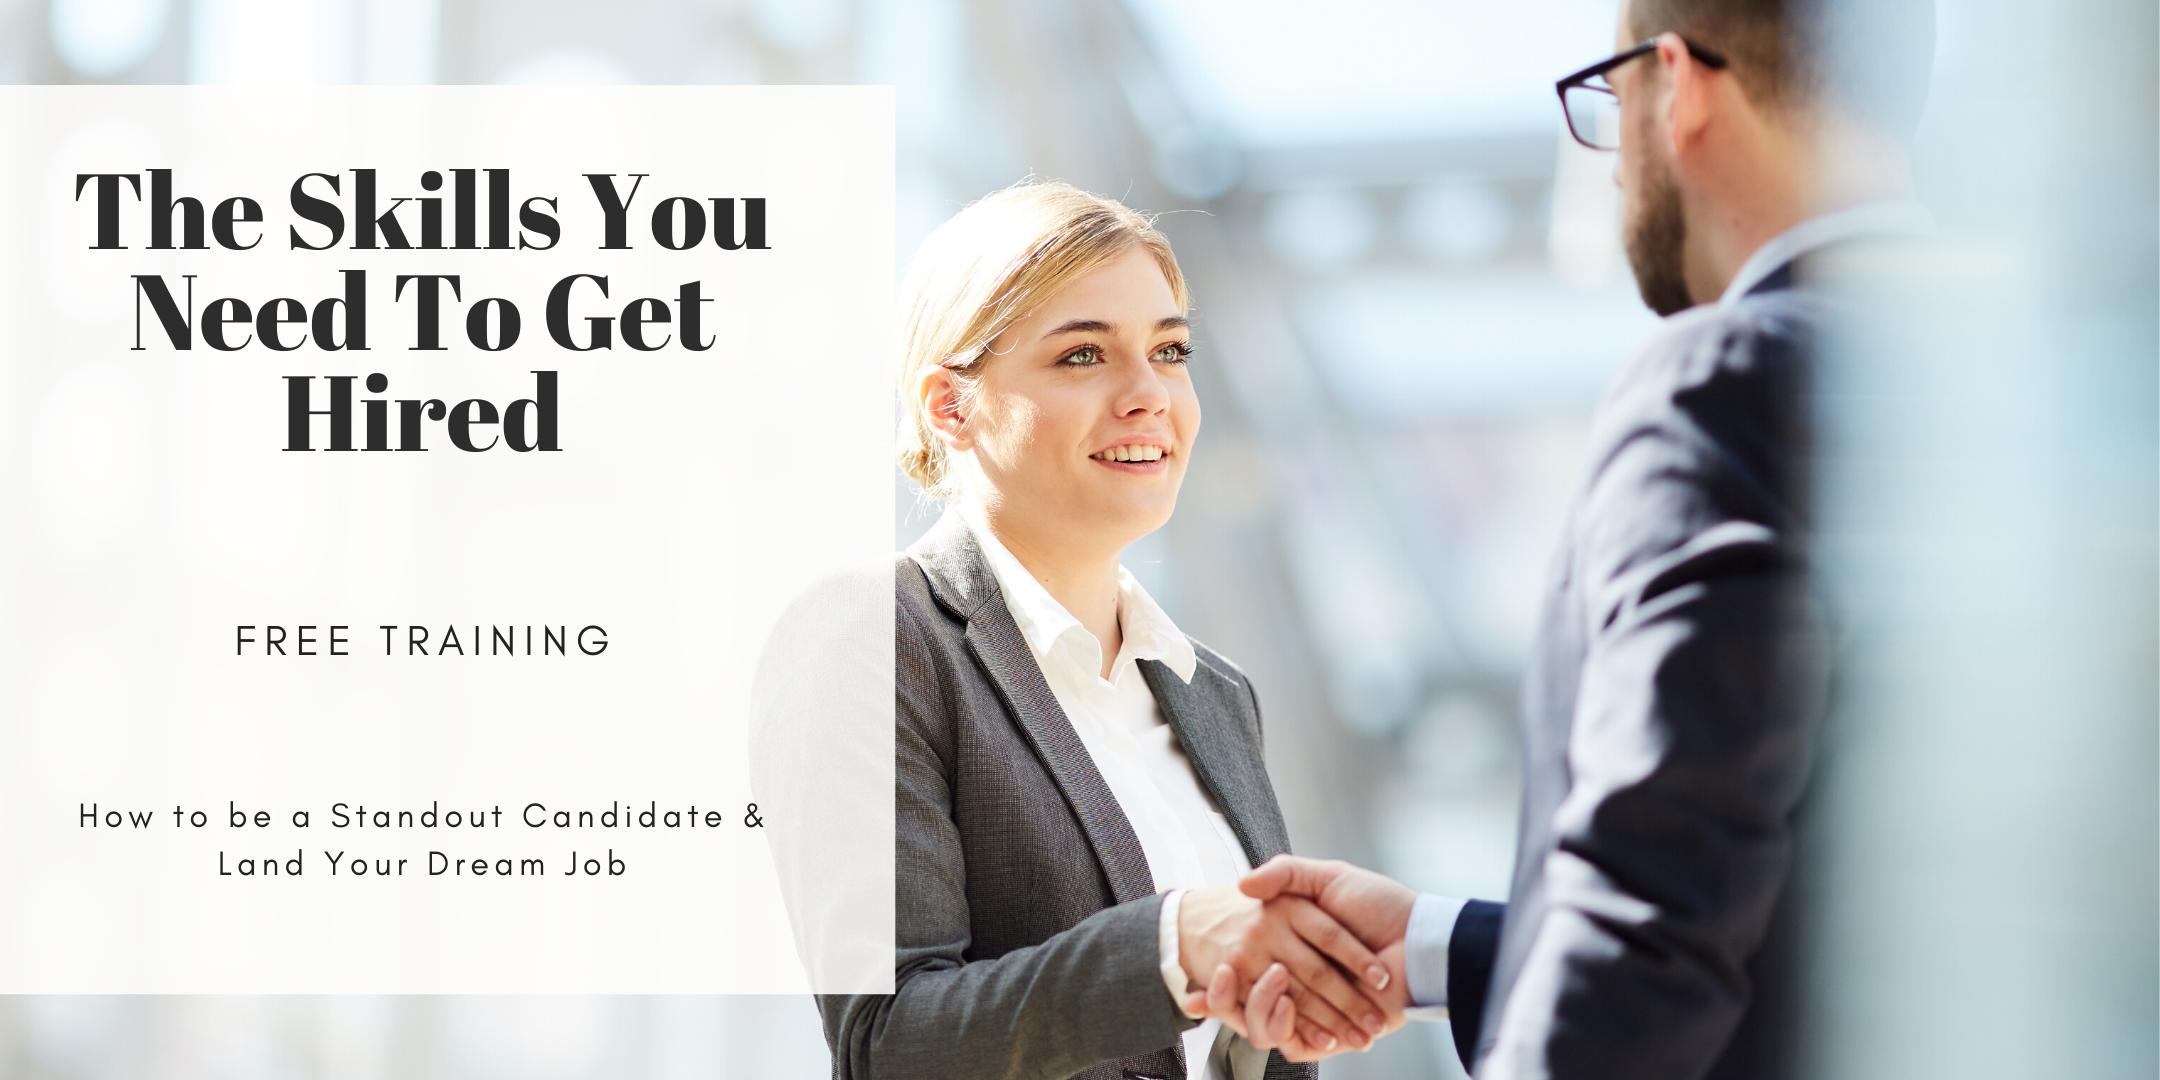 TRAINING: How to Land Your Dream Job (Career Workshop) Pasadena, TX